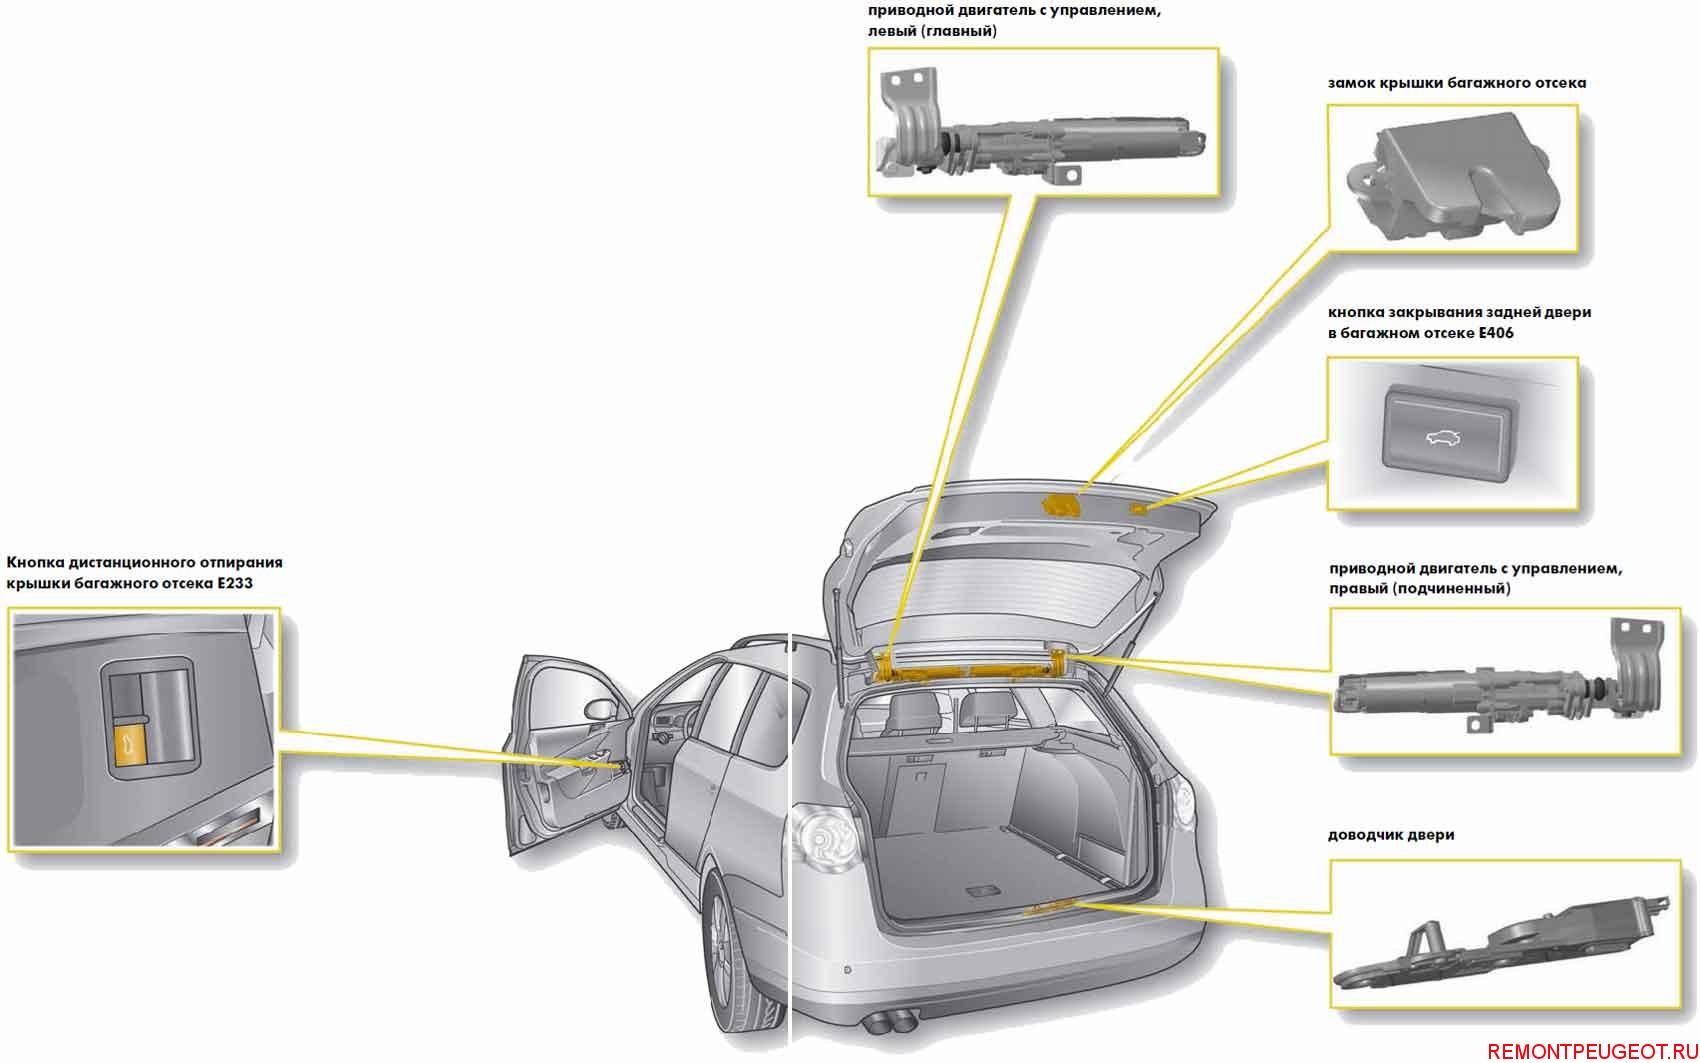 Ремонт концевика крышки багажника форд фокус 2 21 фотография